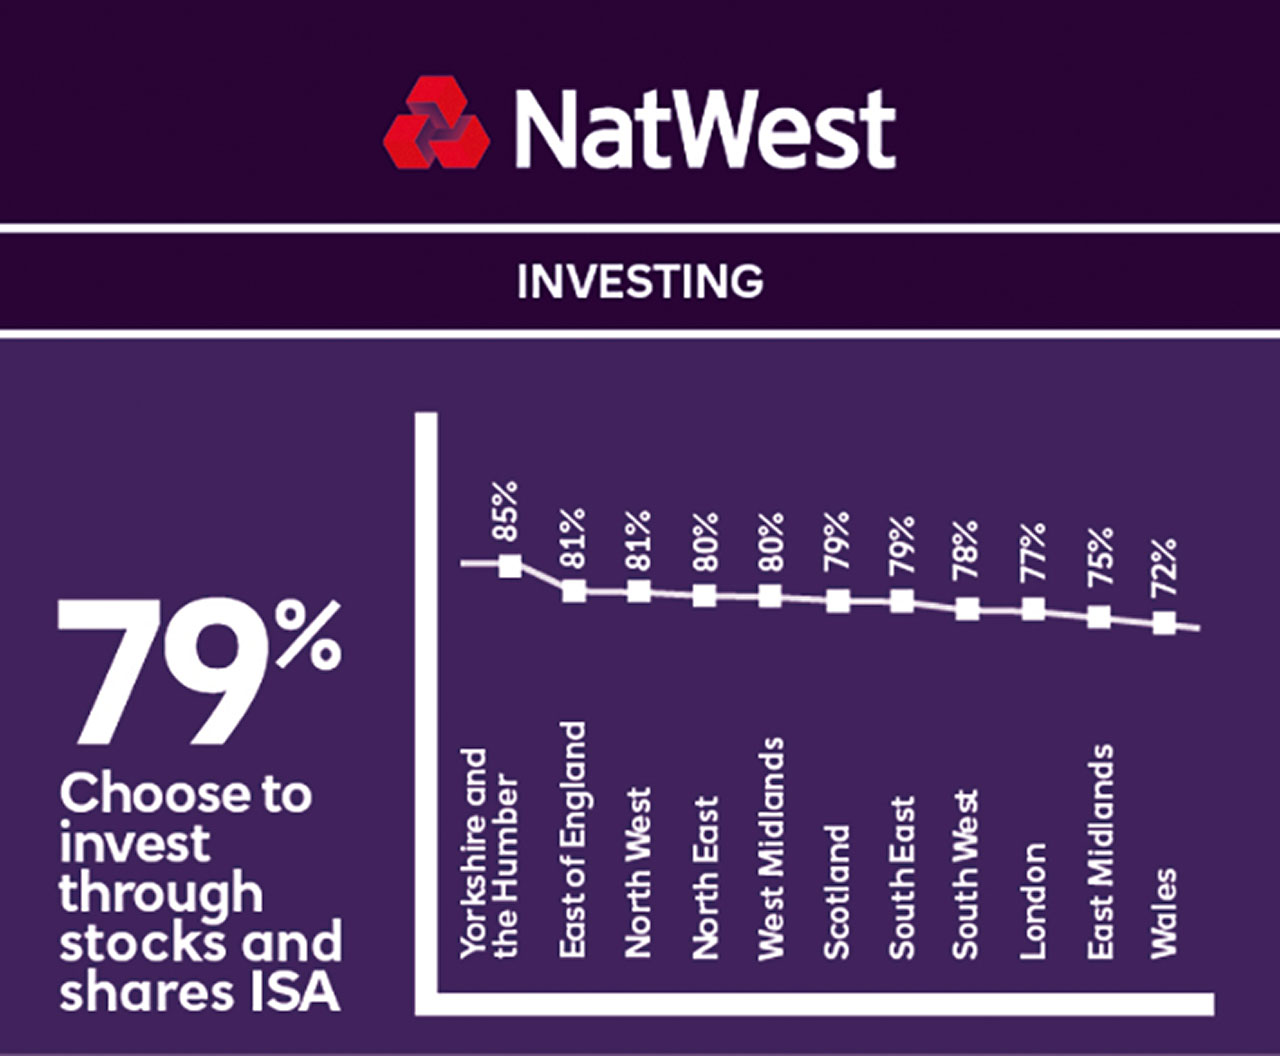 NatWest Premier Regional Investing CMYK